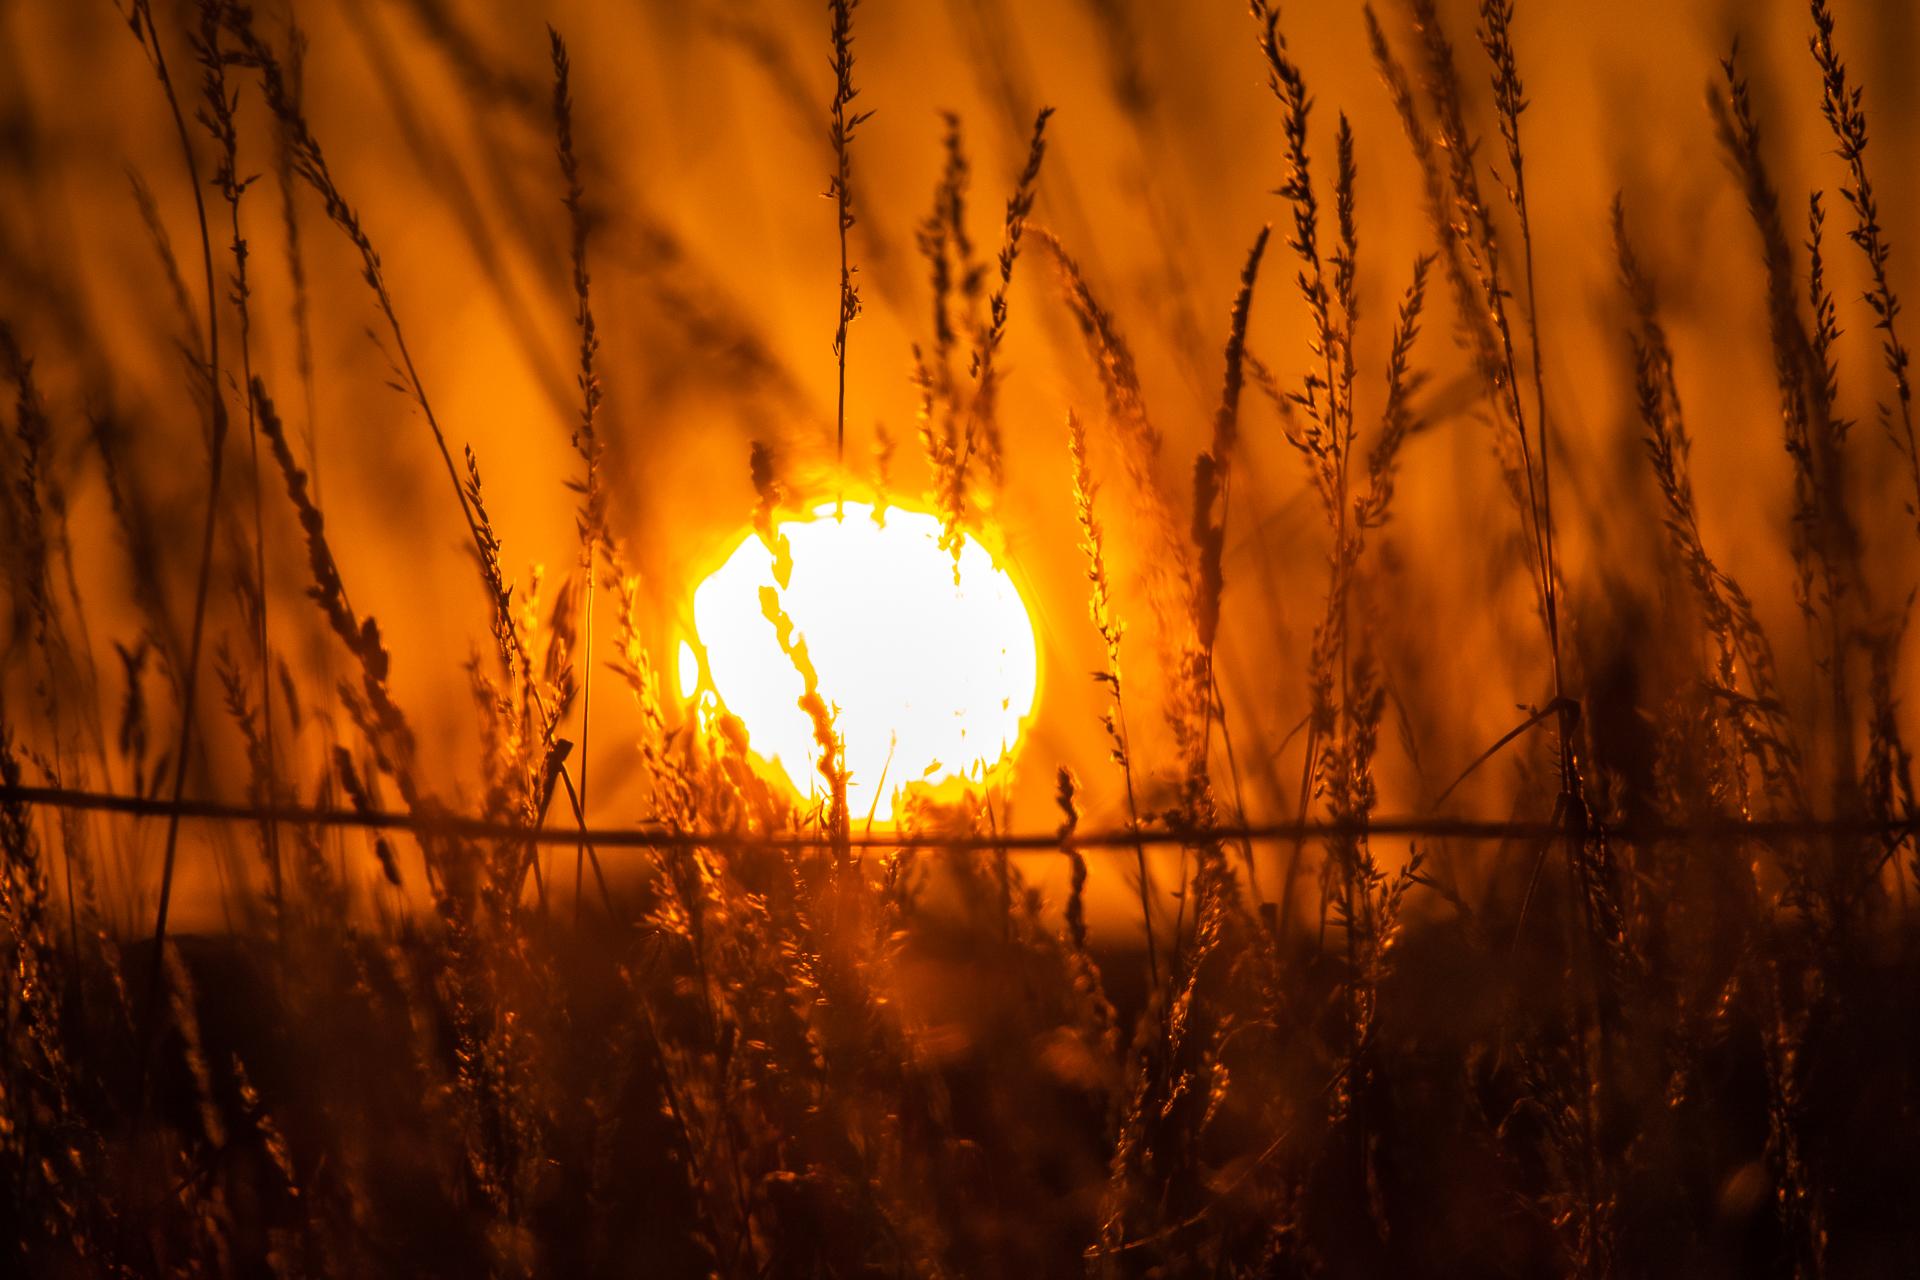 2018-07-07-Sonnenuntergang2.jpg